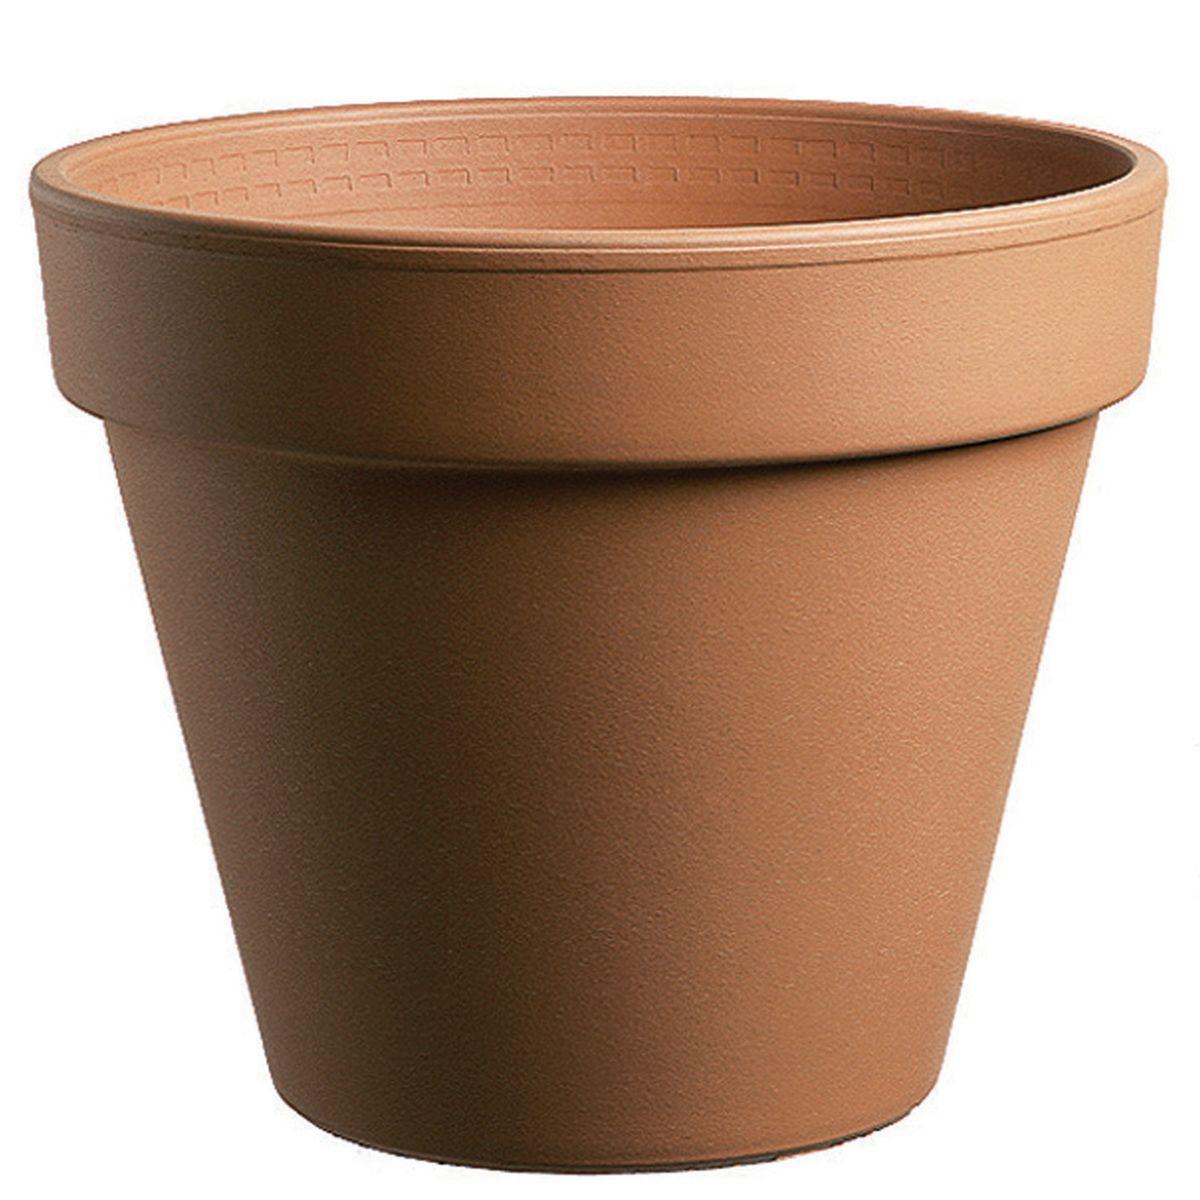 Beautiful vasi da giardino prezzi photos acrylicgiftware for Vasi da giardino in plastica